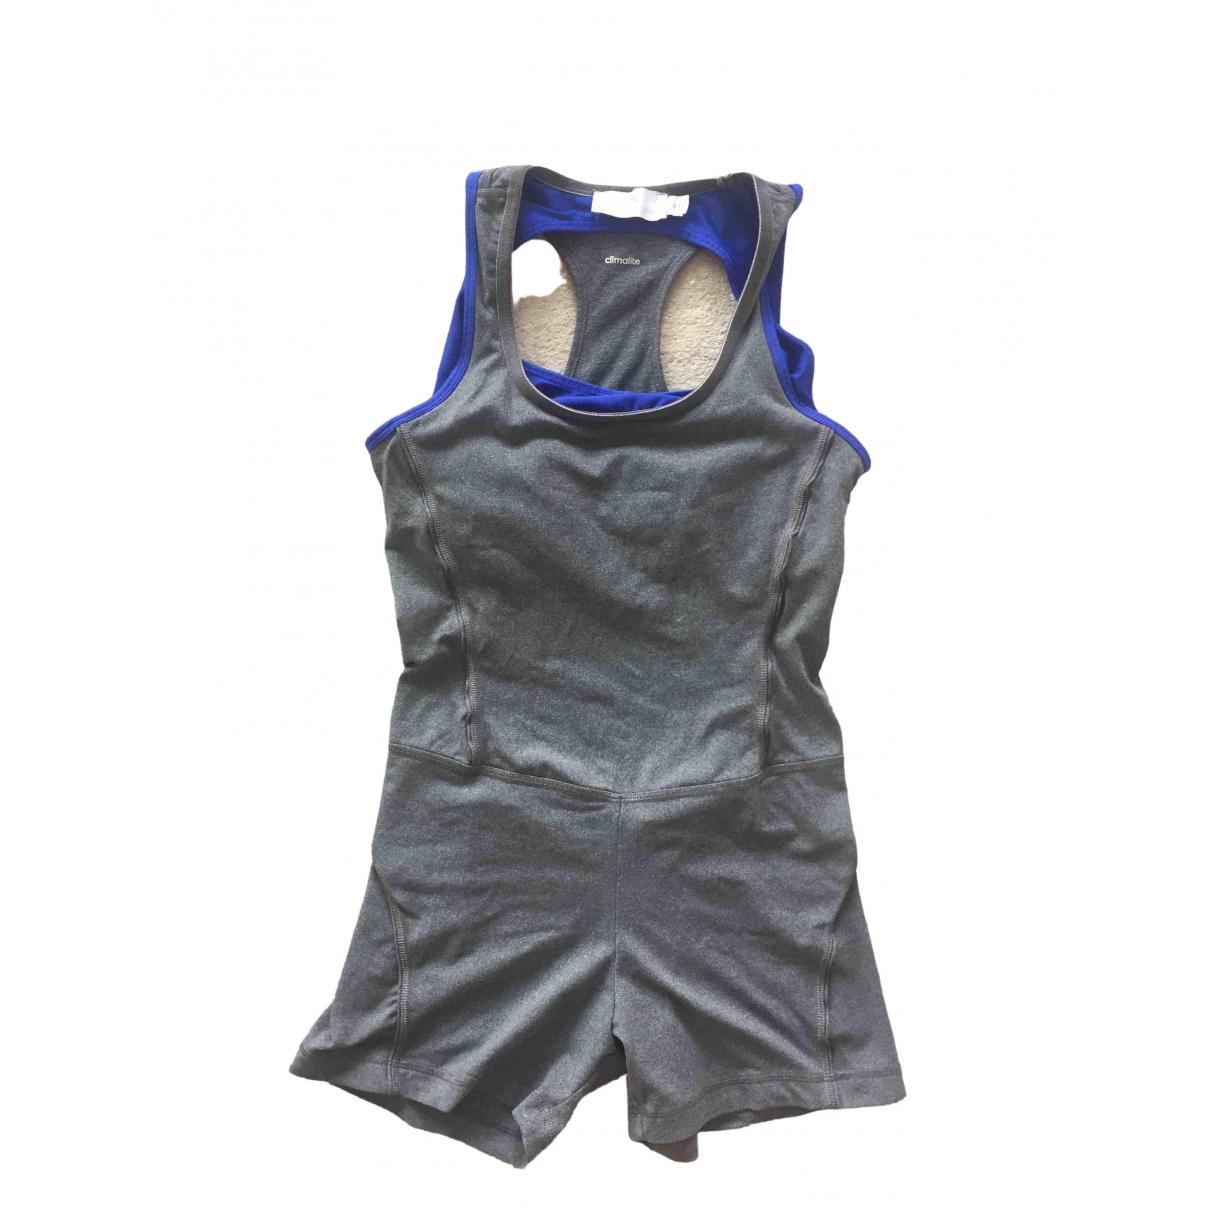 Stella Mccartney Pour Adidas \N Grey jumpsuit for Women M International